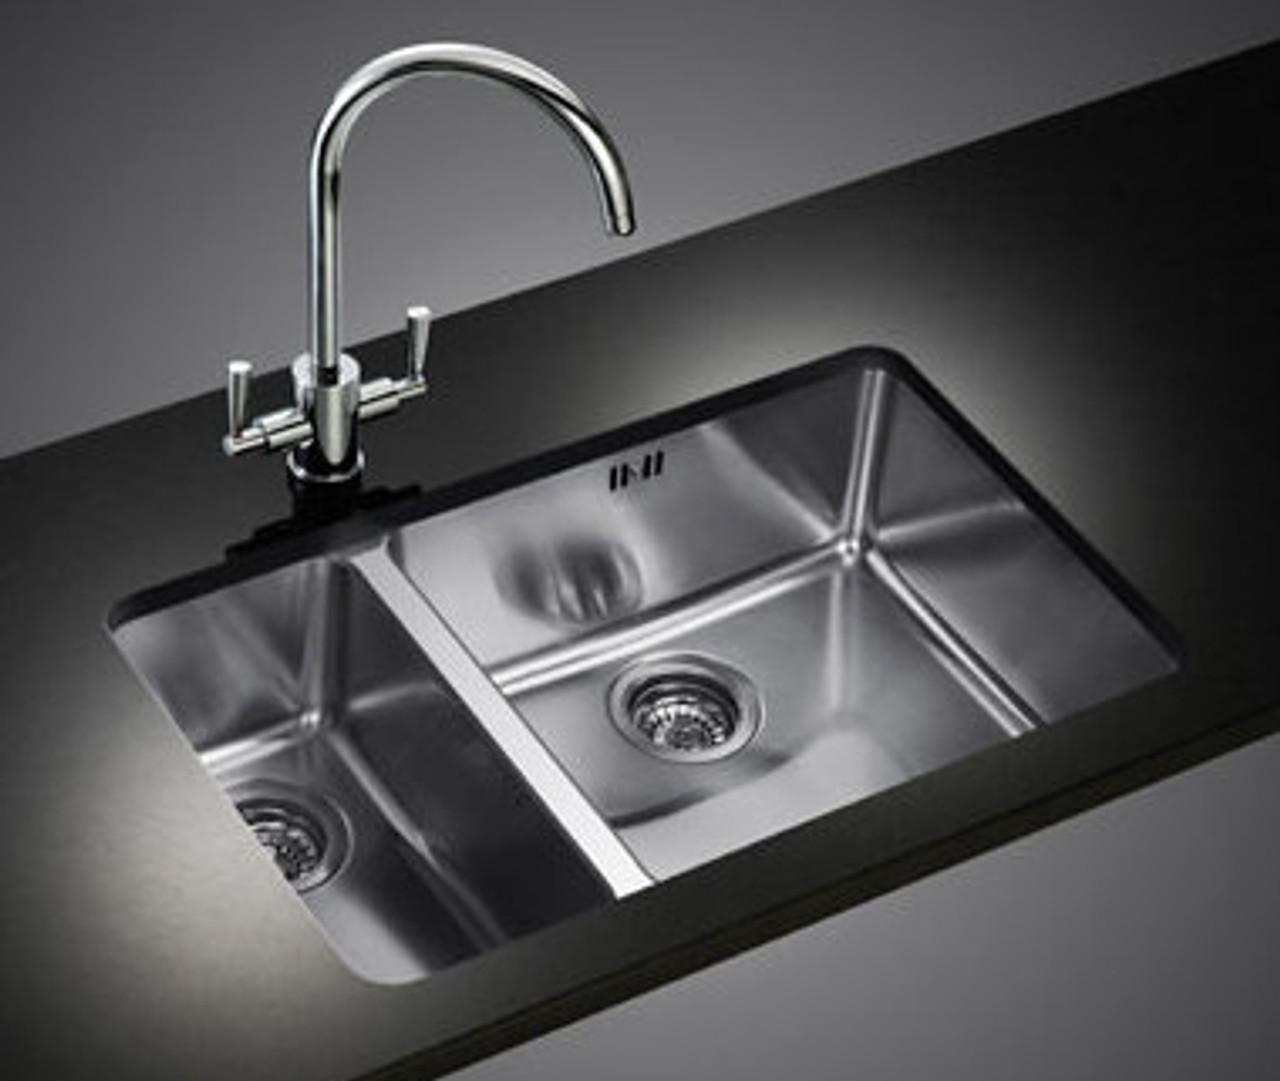 Awe Inspiring Franke Kubus Kbx160 45 20 Stainless Steel Kitchen Sink Home Interior And Landscaping Ologienasavecom